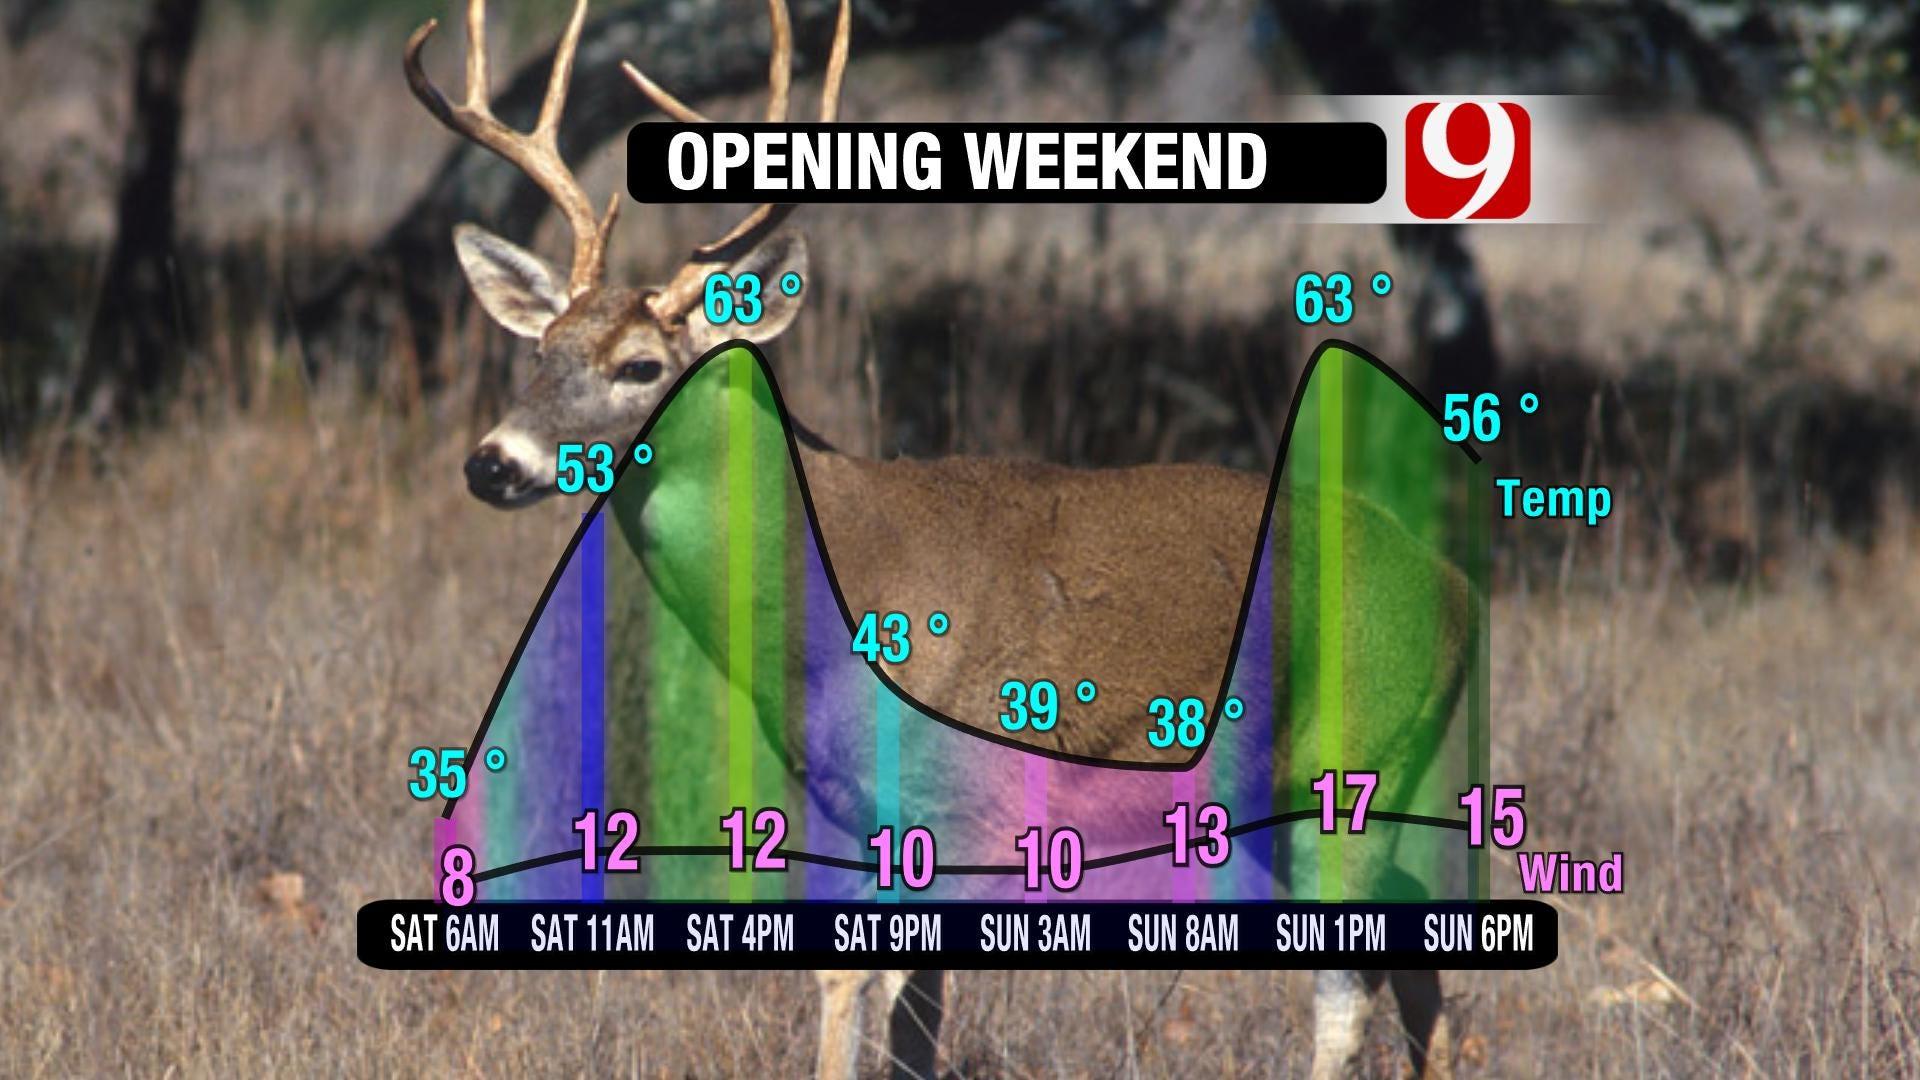 Rifle Season Opens in 2 Days